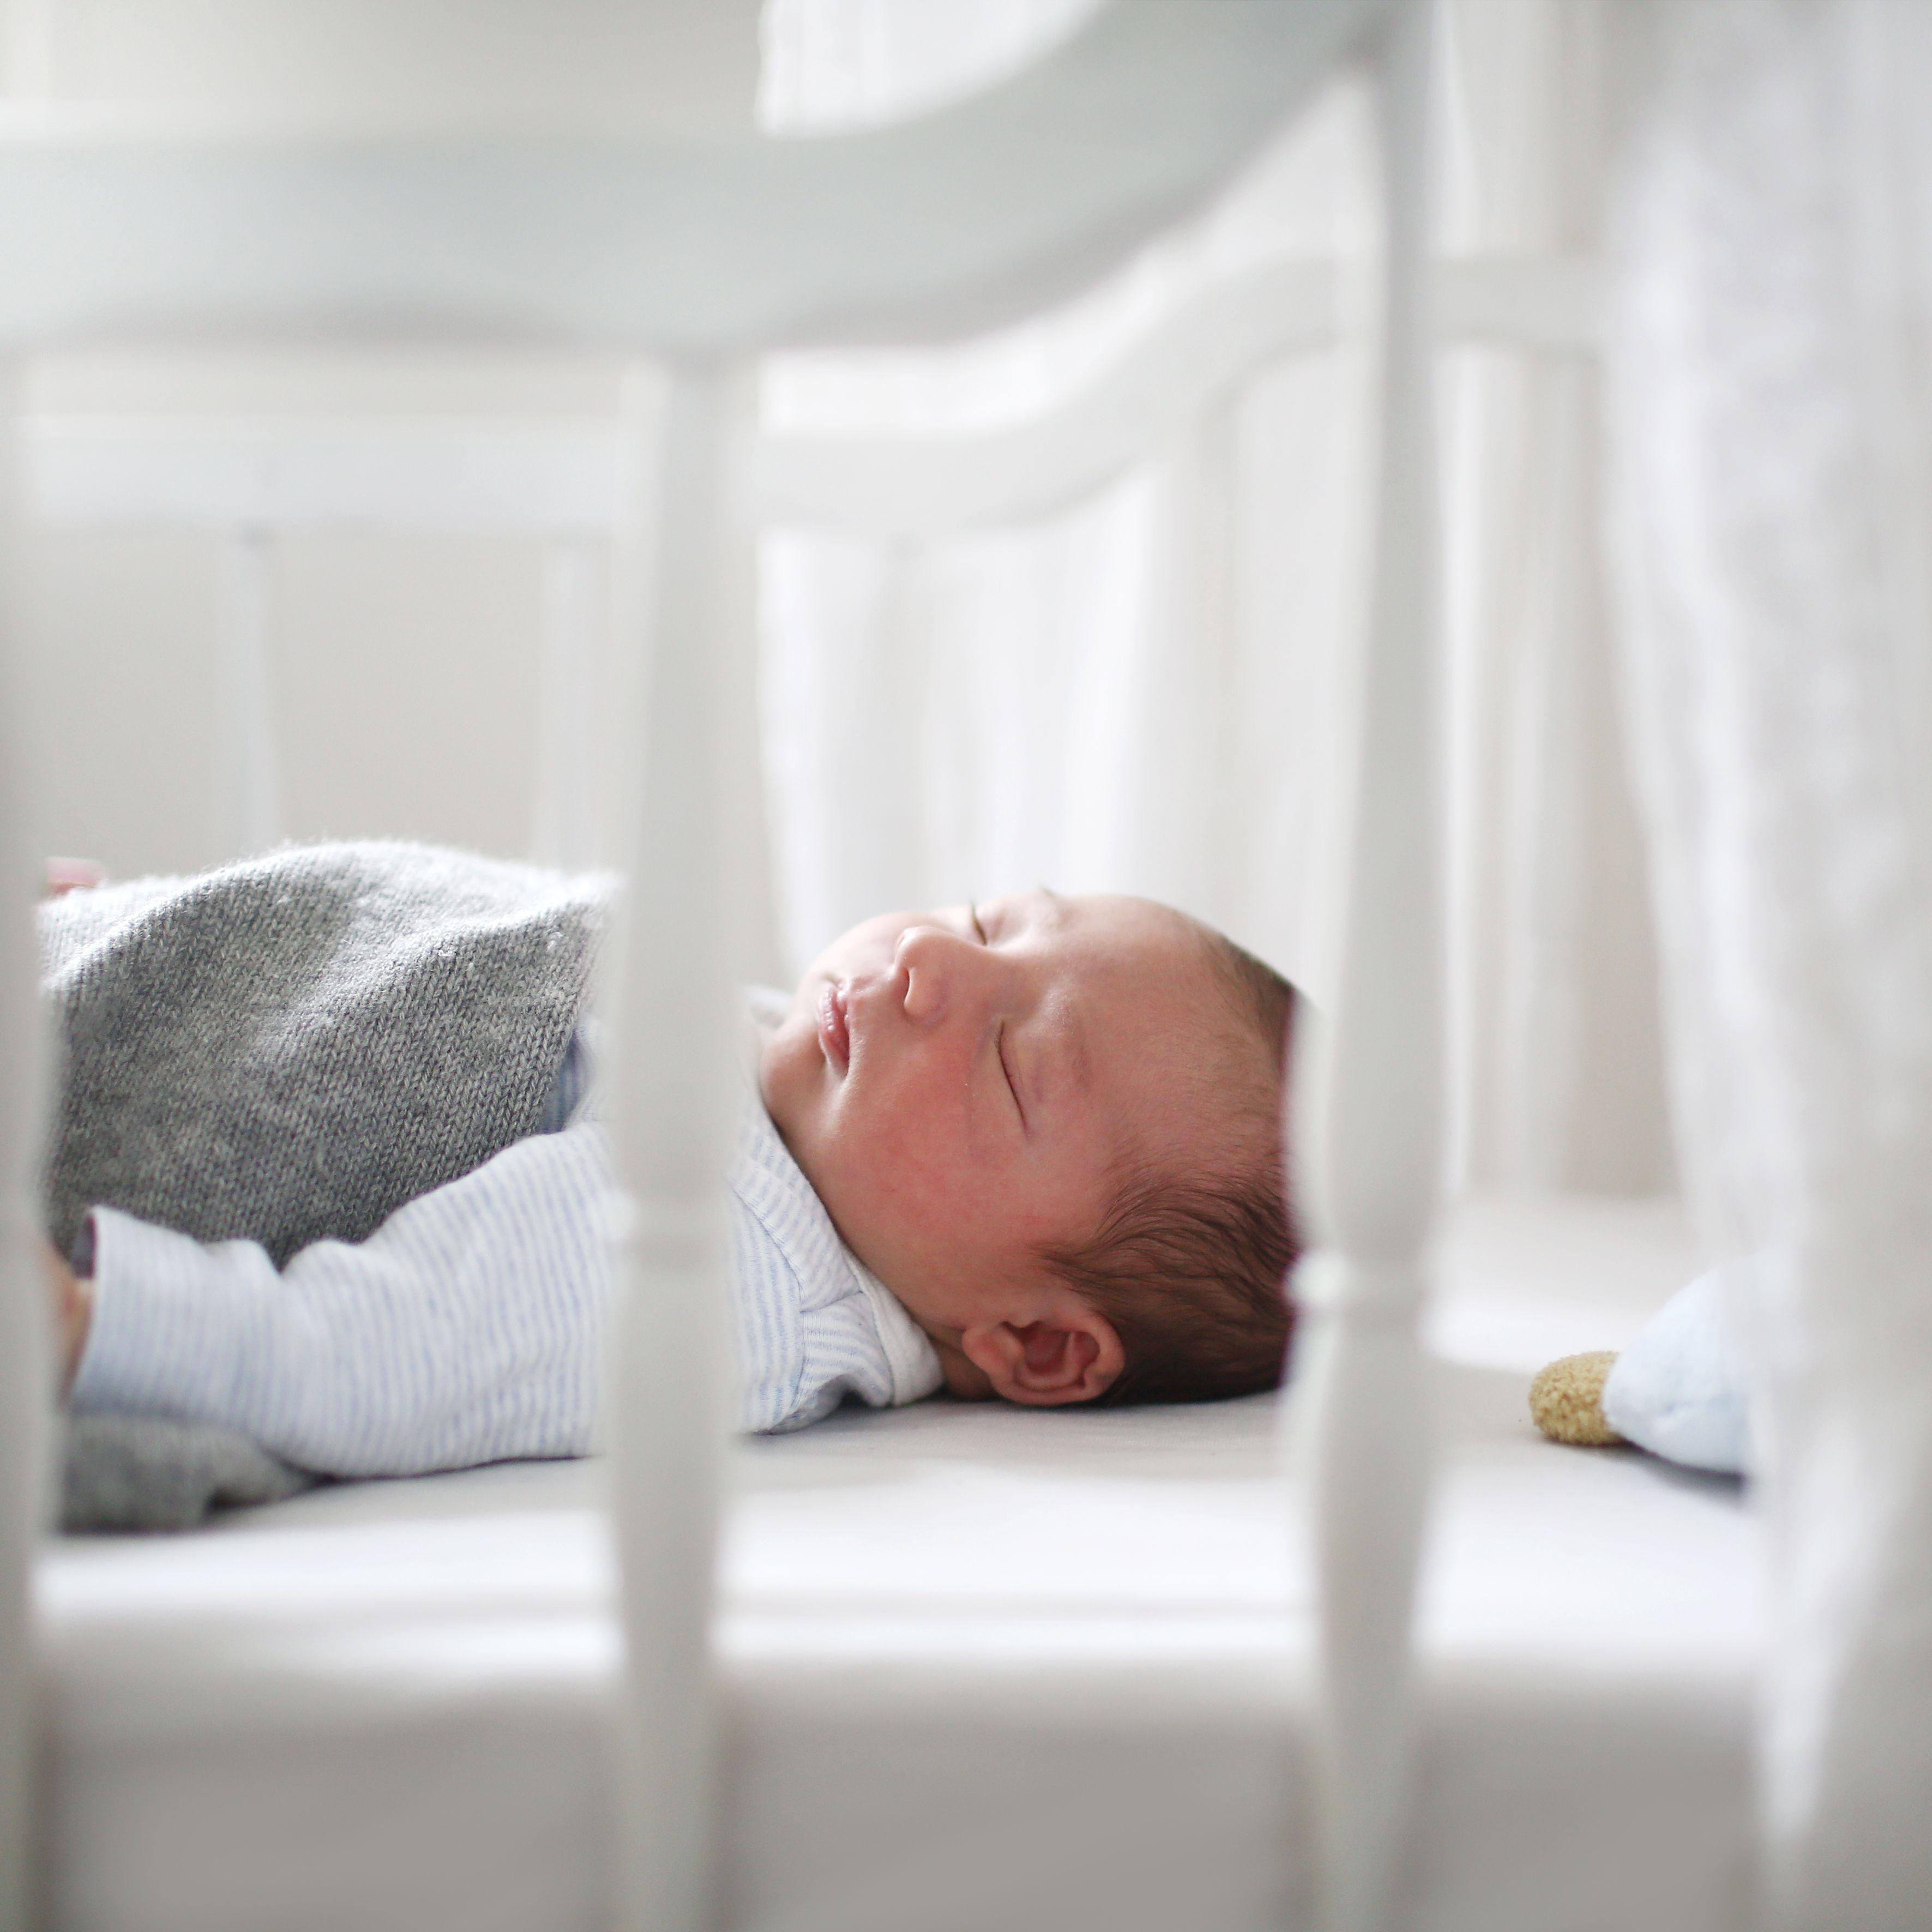 Where Should Your Baby Sleep